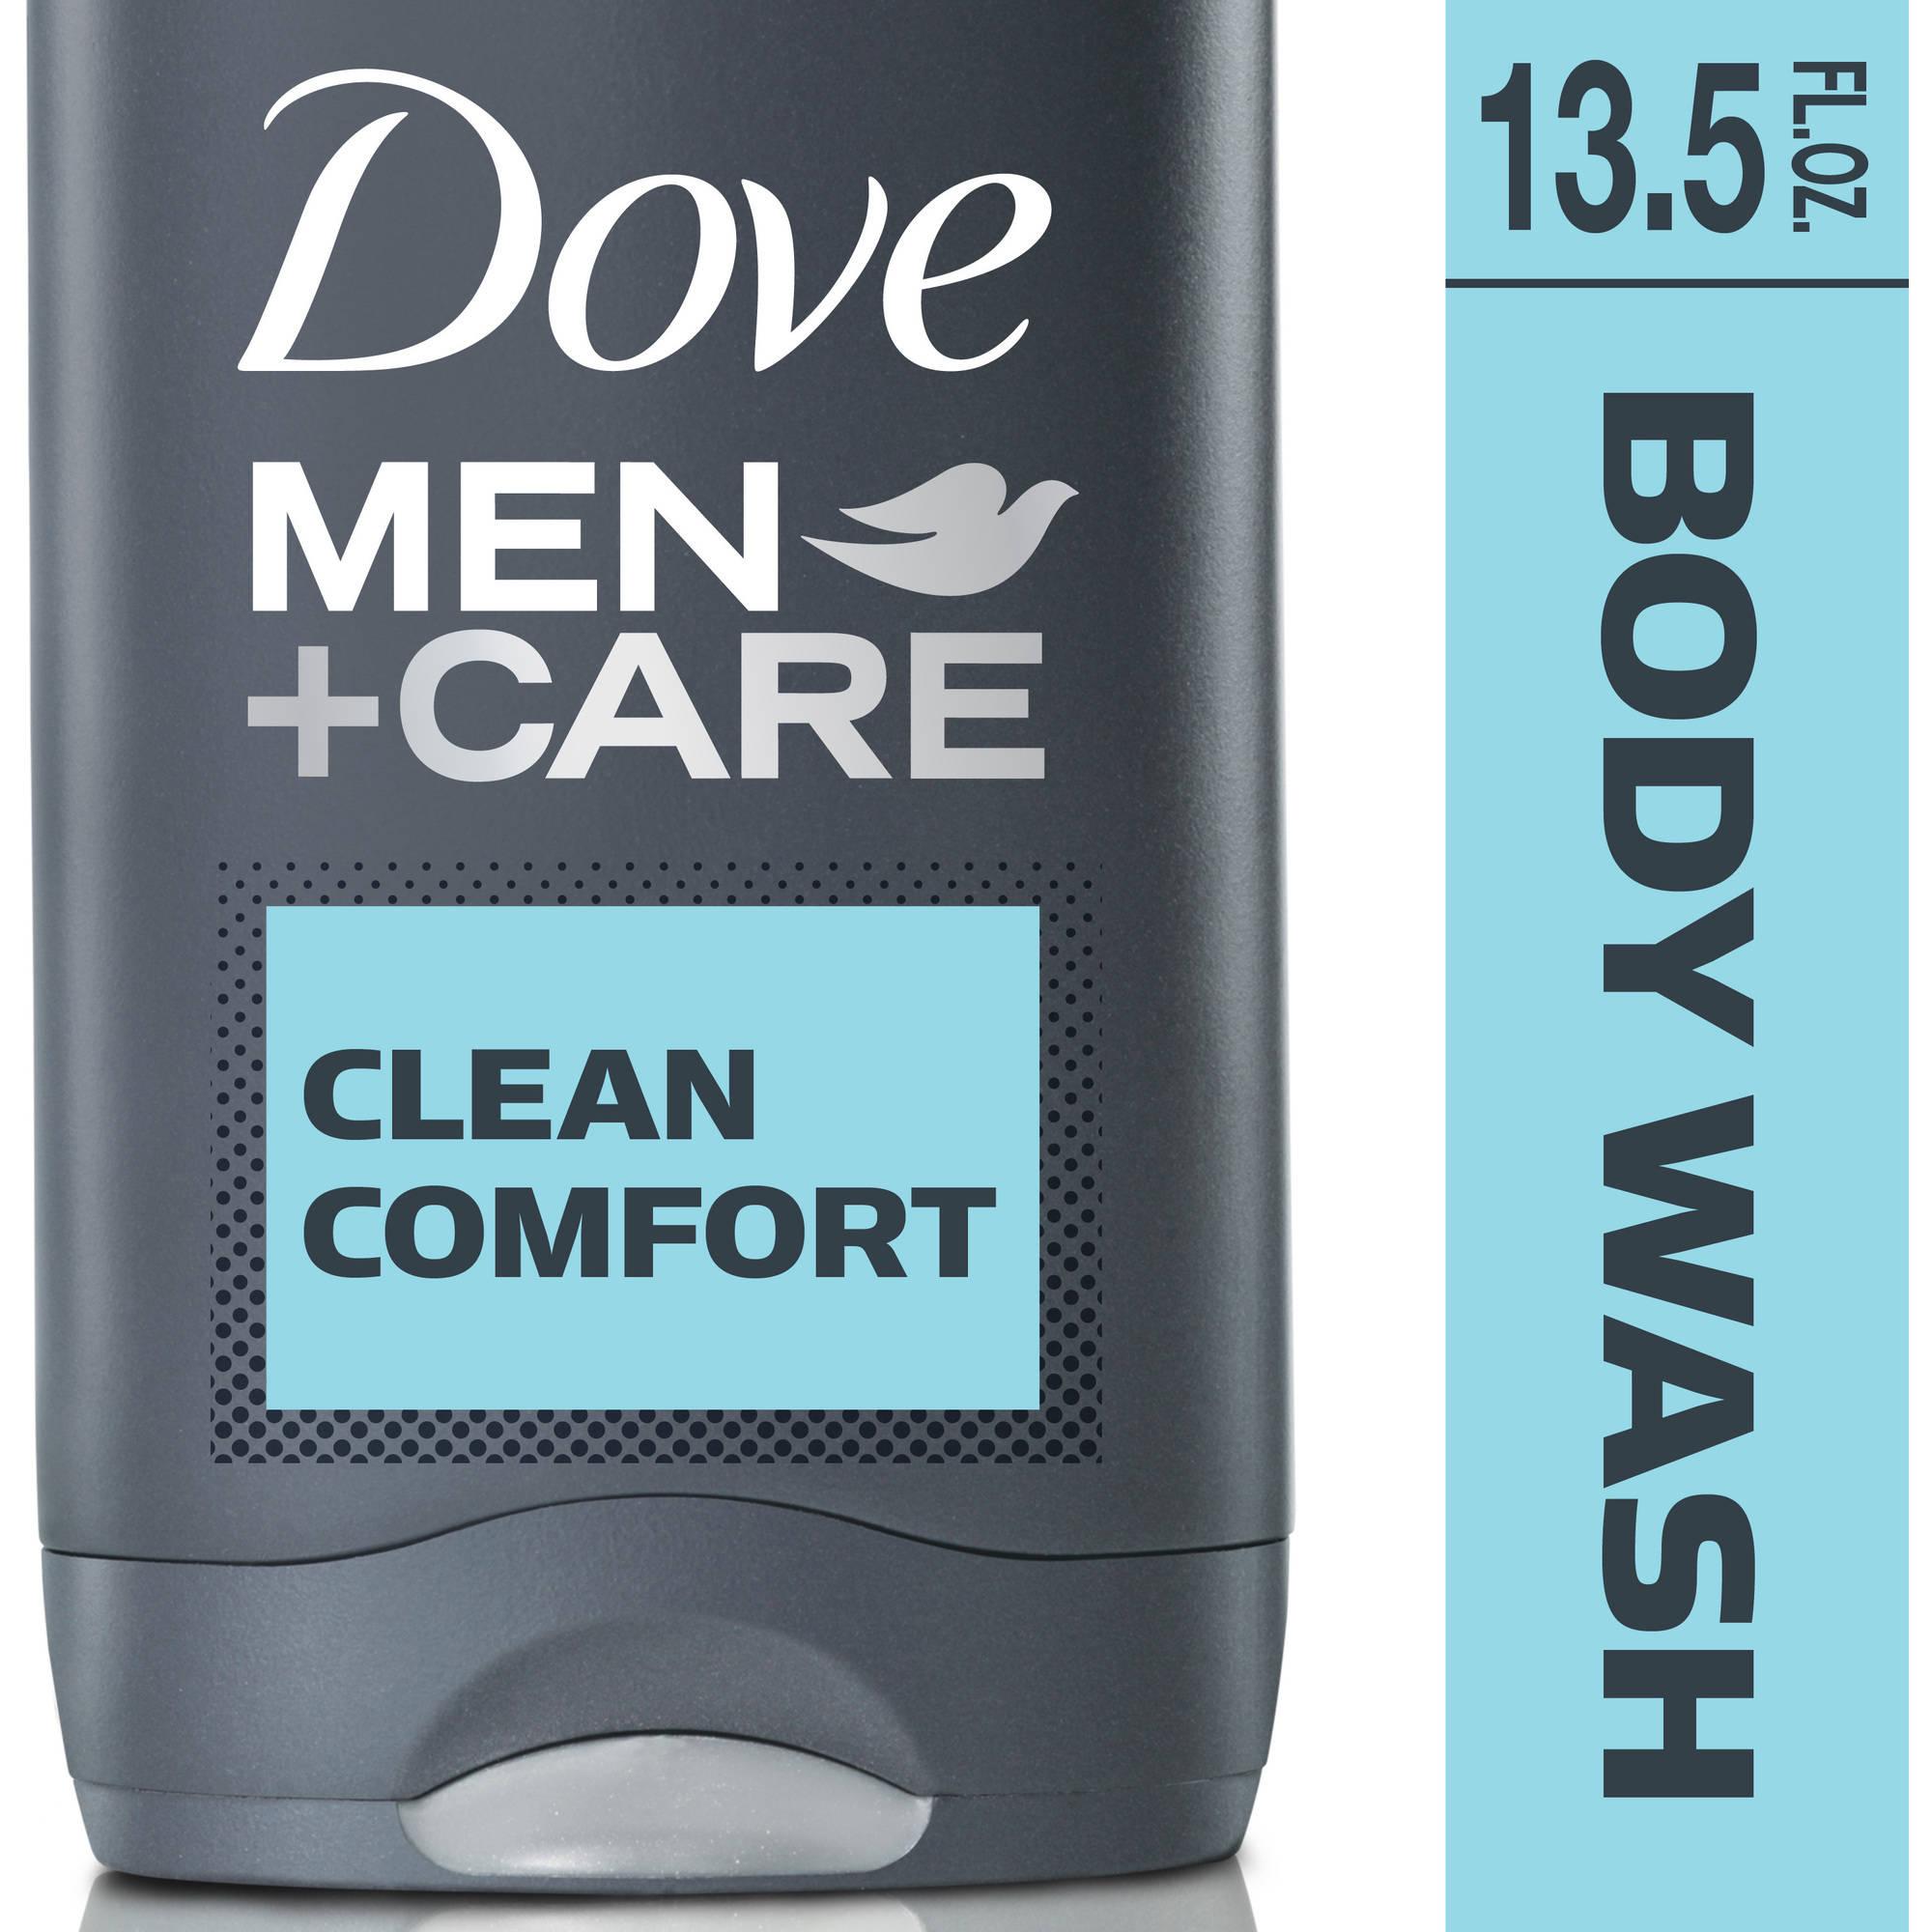 Dove Men+Care Clean Comfort Body and Face Wash, 13.5 fl oz